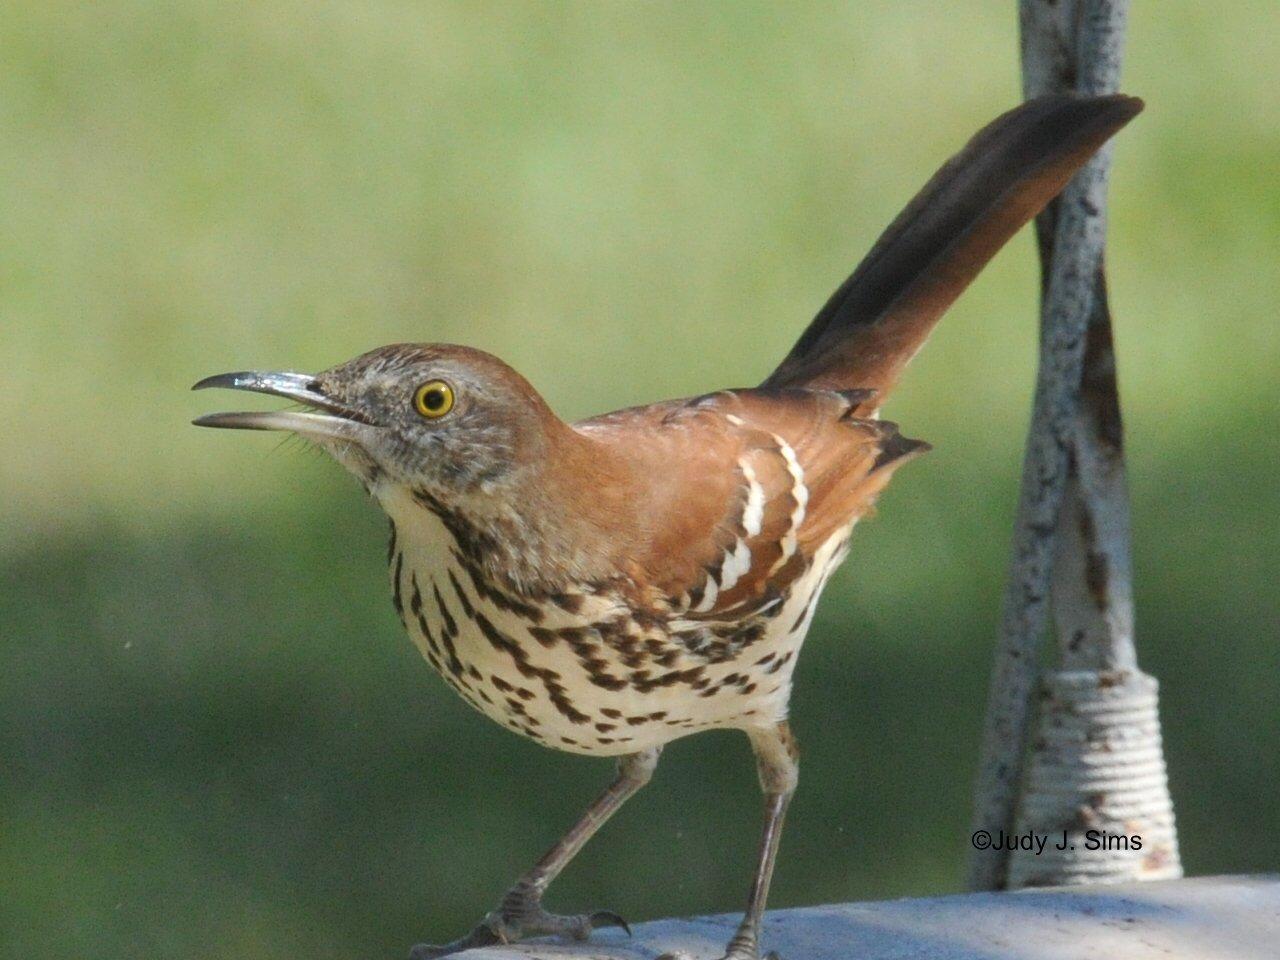 East Texas Birder on The Move: More Birds of My Backyard!